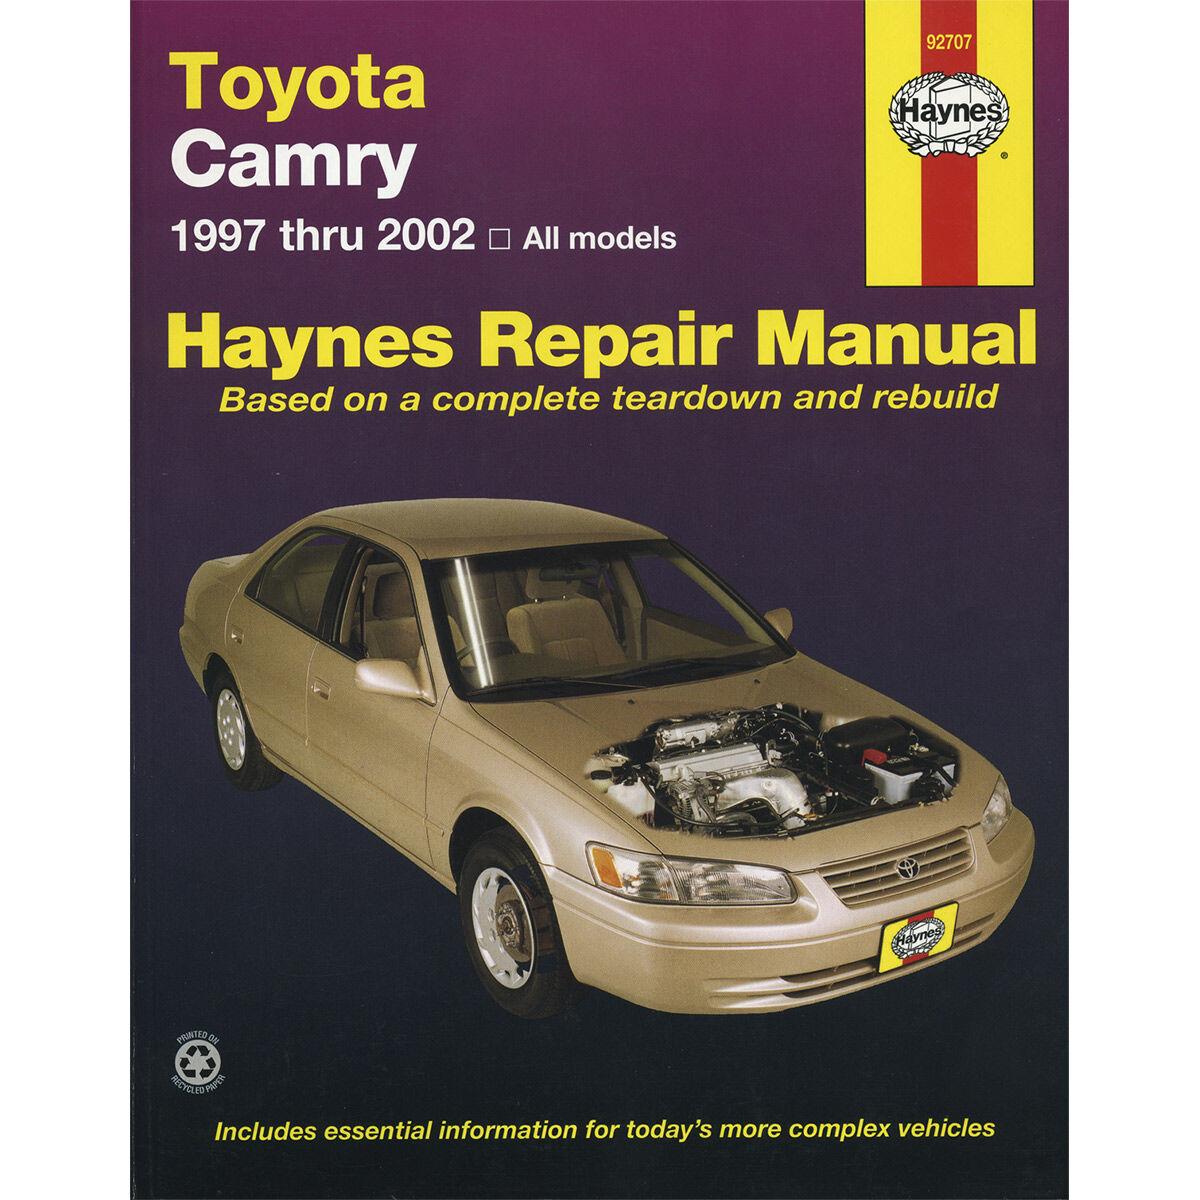 haynes car manual for toyota camry 1997 2002 92707 supercheap rh  supercheapauto co nz toyota camry 1997 service manual pdf ...